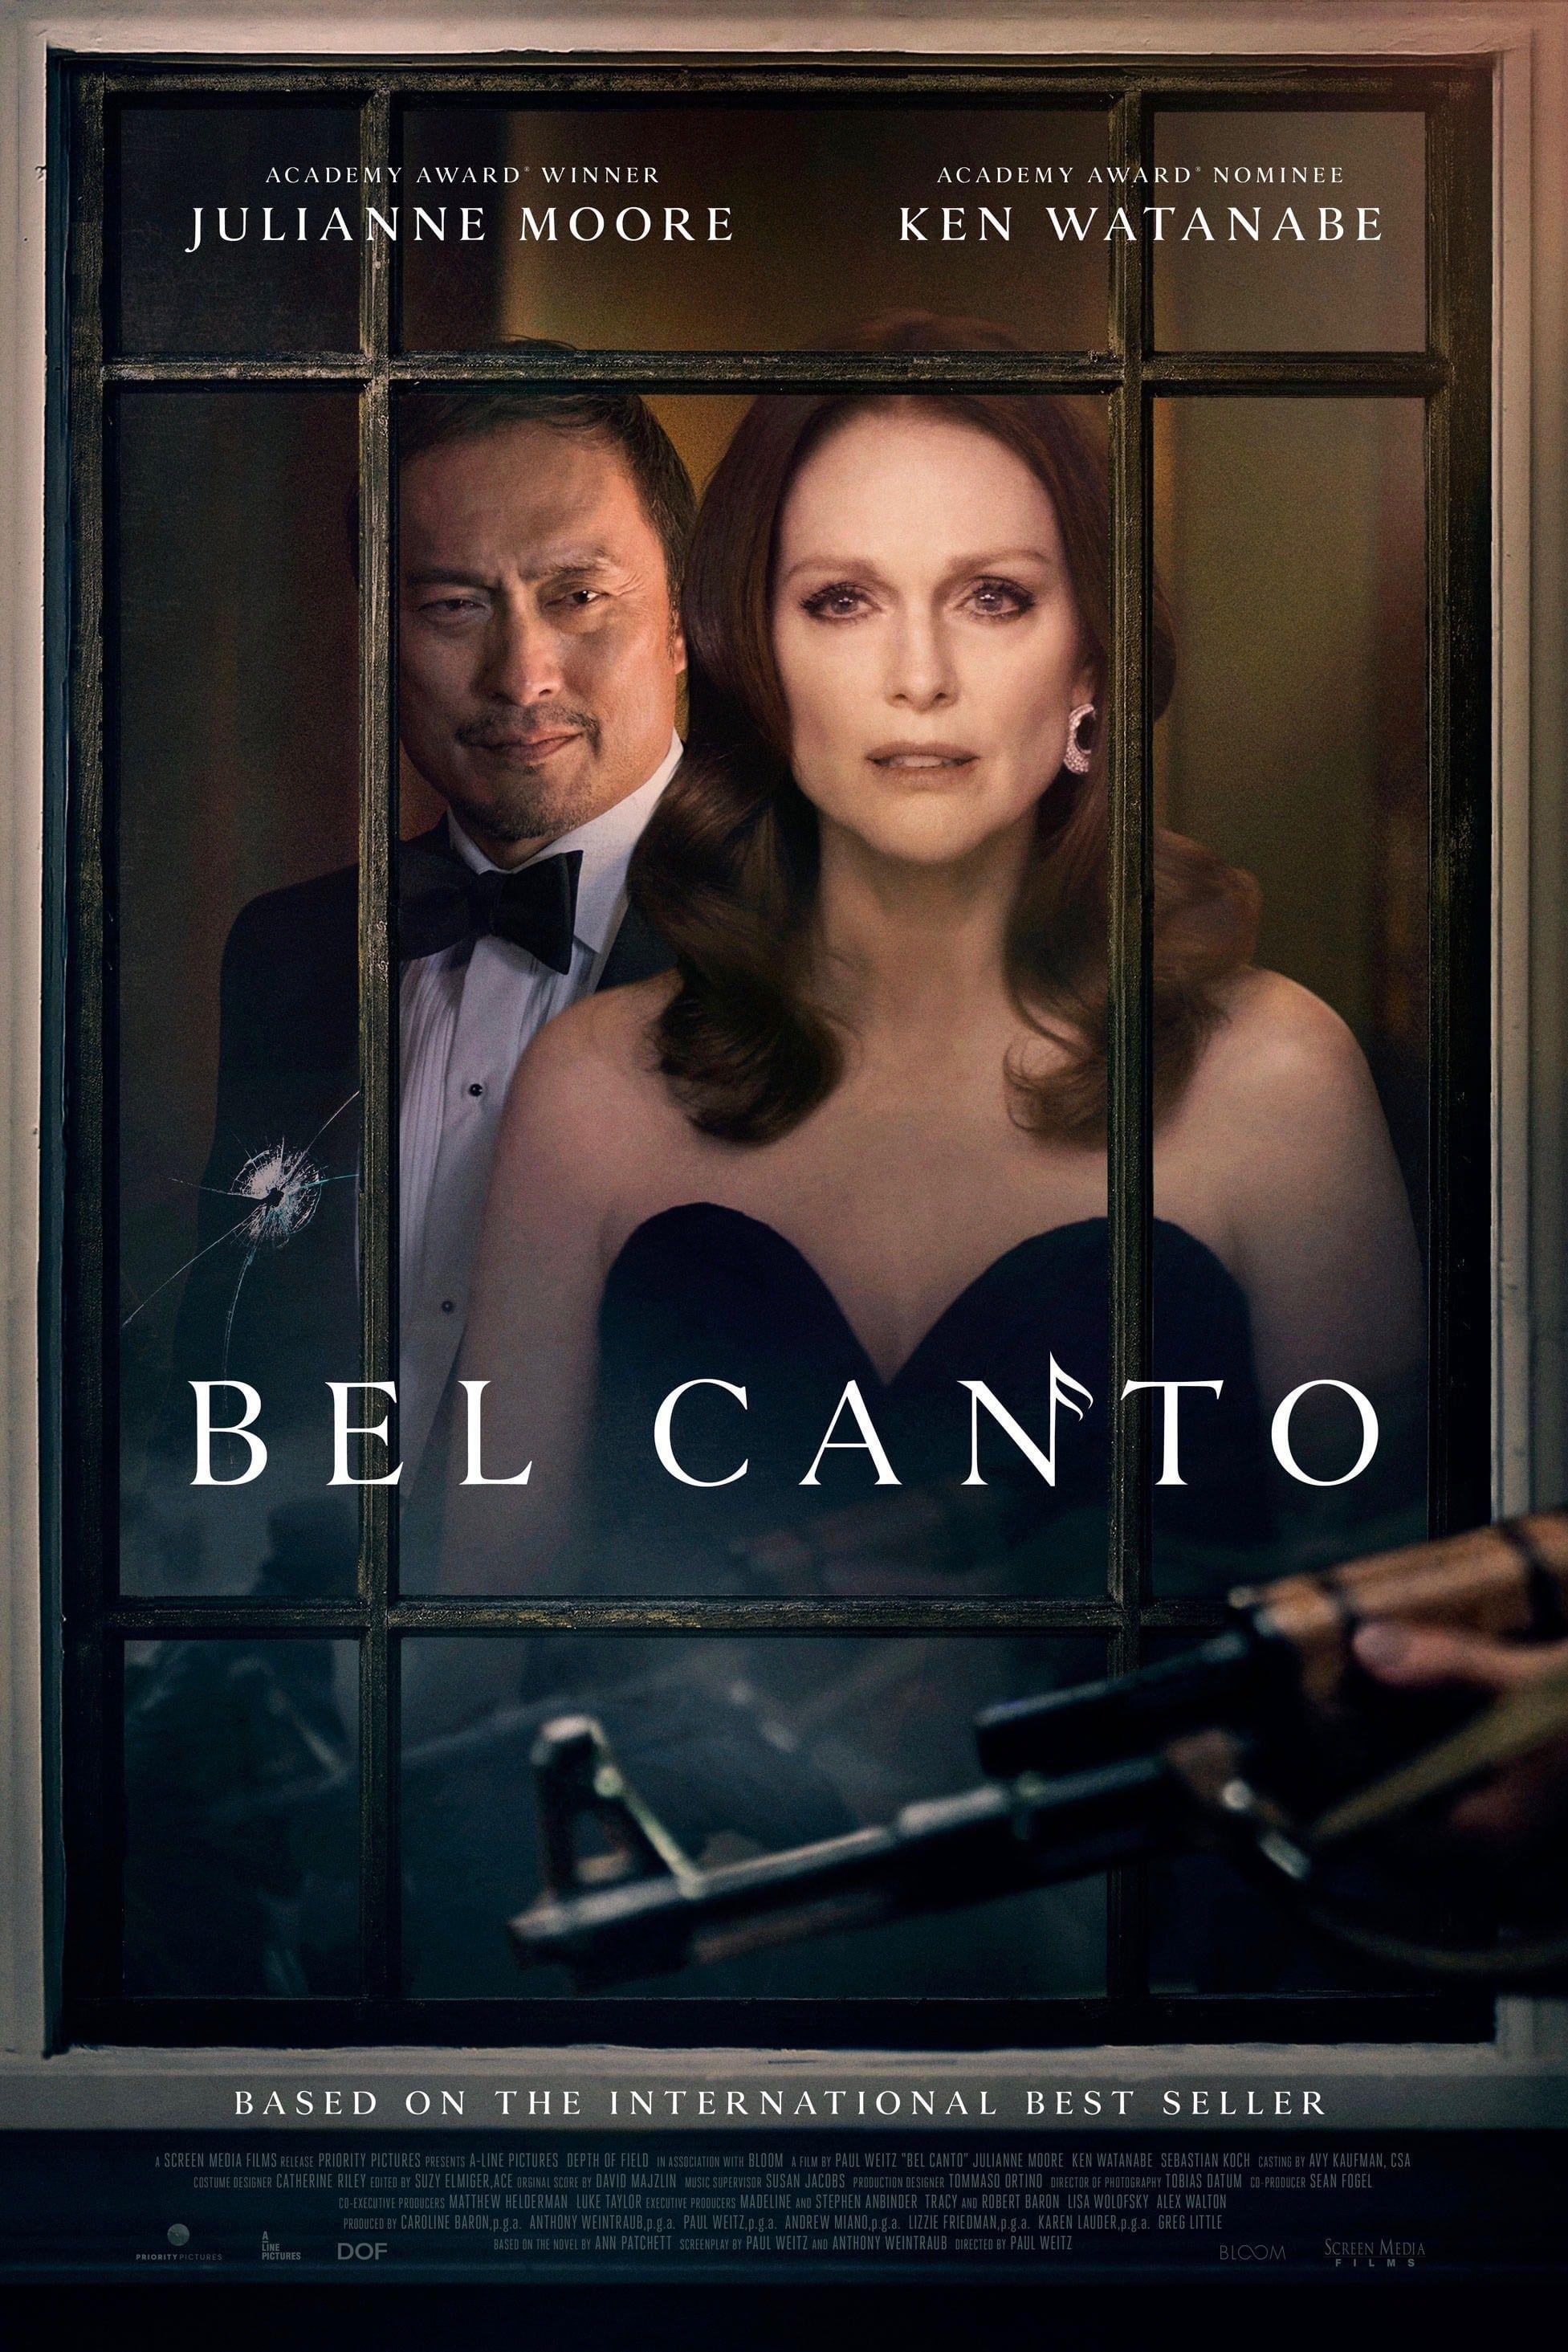 Hd 1080p Bel Canto Pelicula Completa En Español Latino Mega Videos Líñea Español Bel Canto Free Movies Online Full Movies Online Free